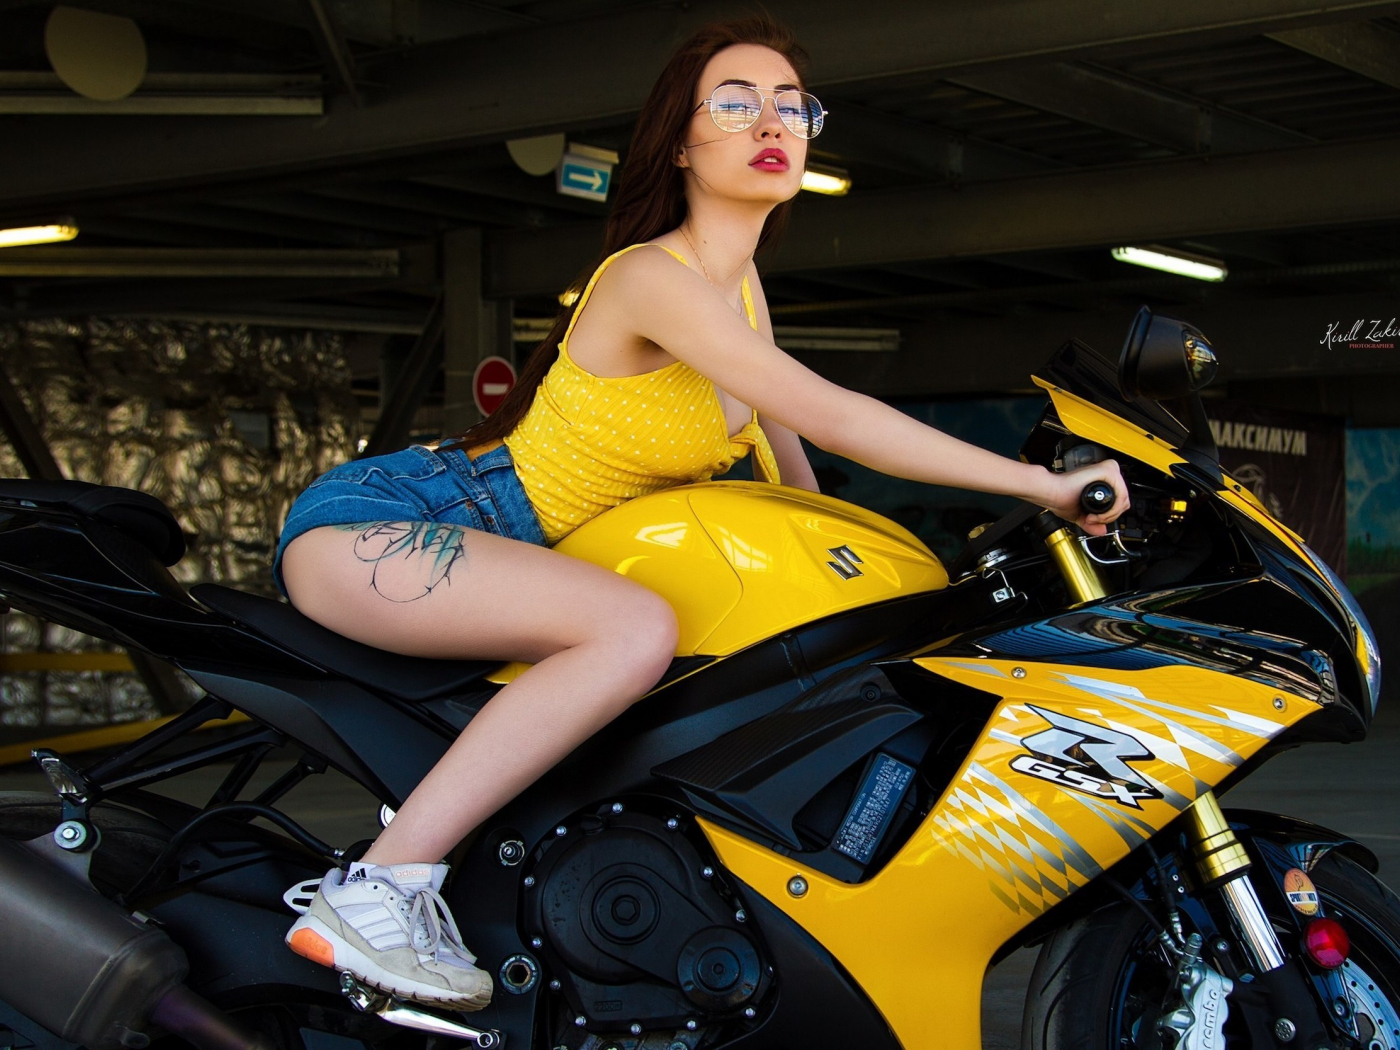 Bike and woman, sports bike, short jeans, 1400x1050 wallpaper